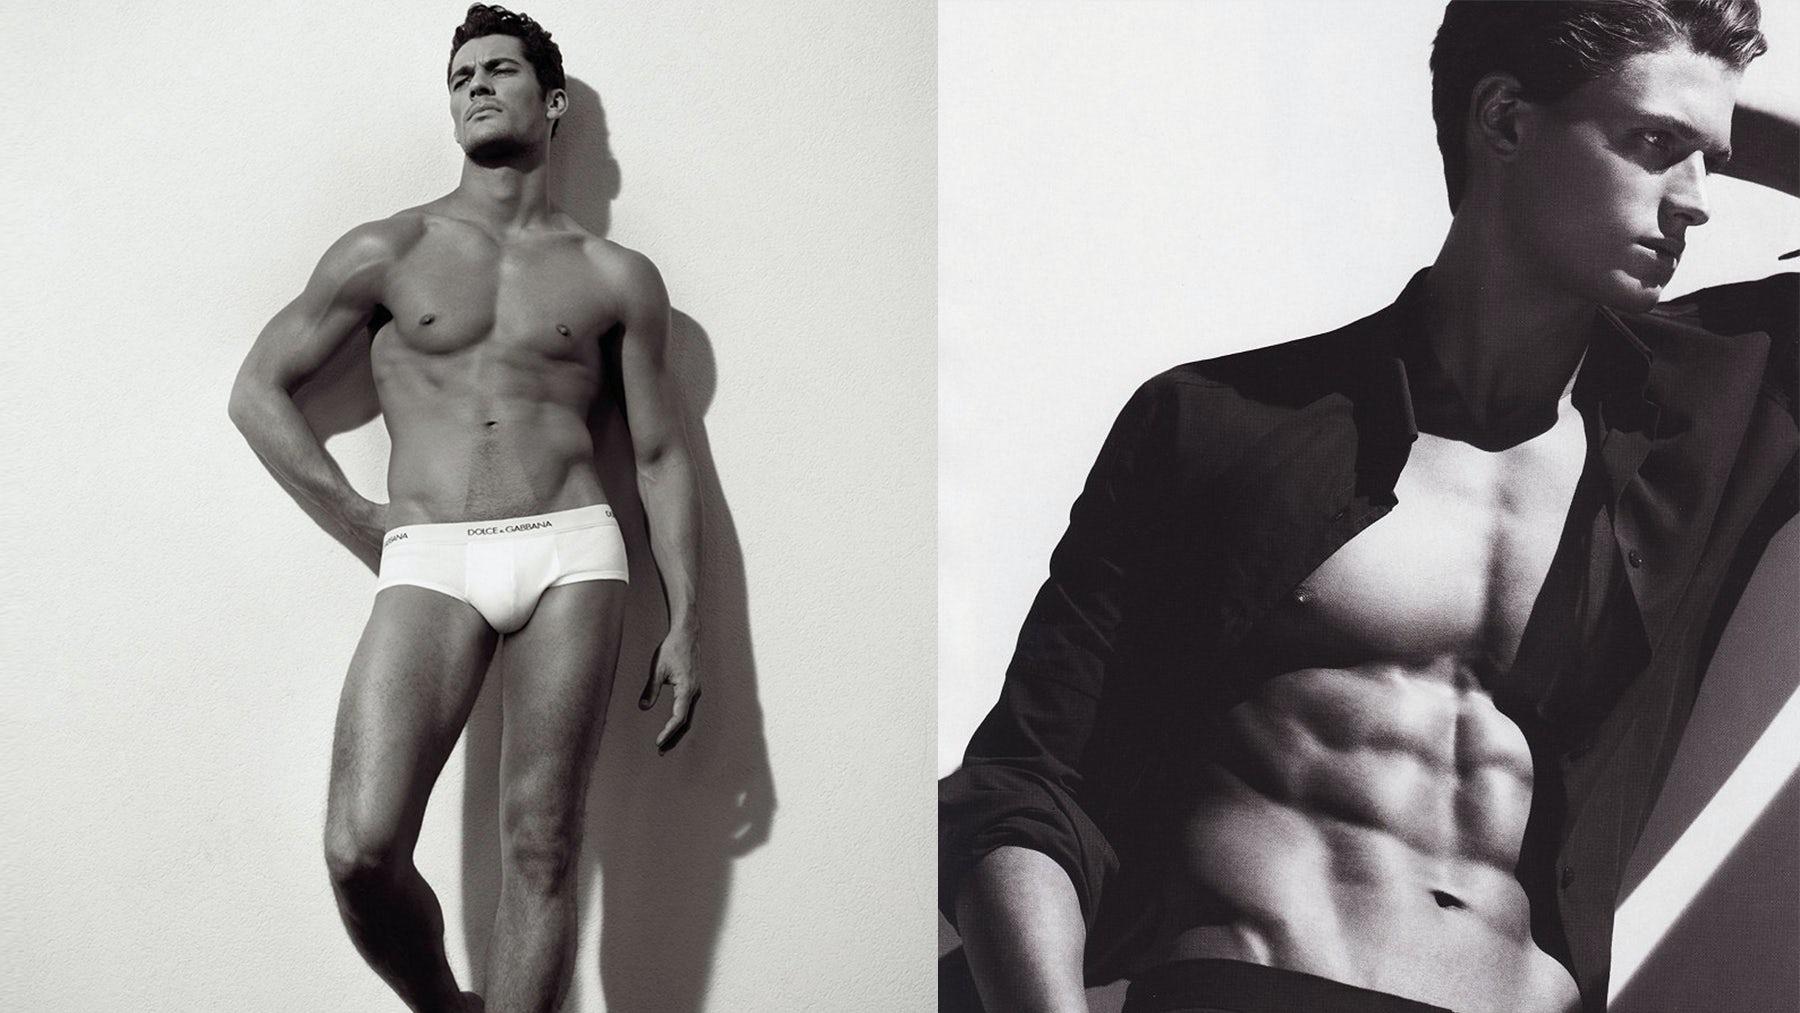 David Gandy for Dolce & Gabbana and Garrett Neff for Calvin Klein | Source: BoF